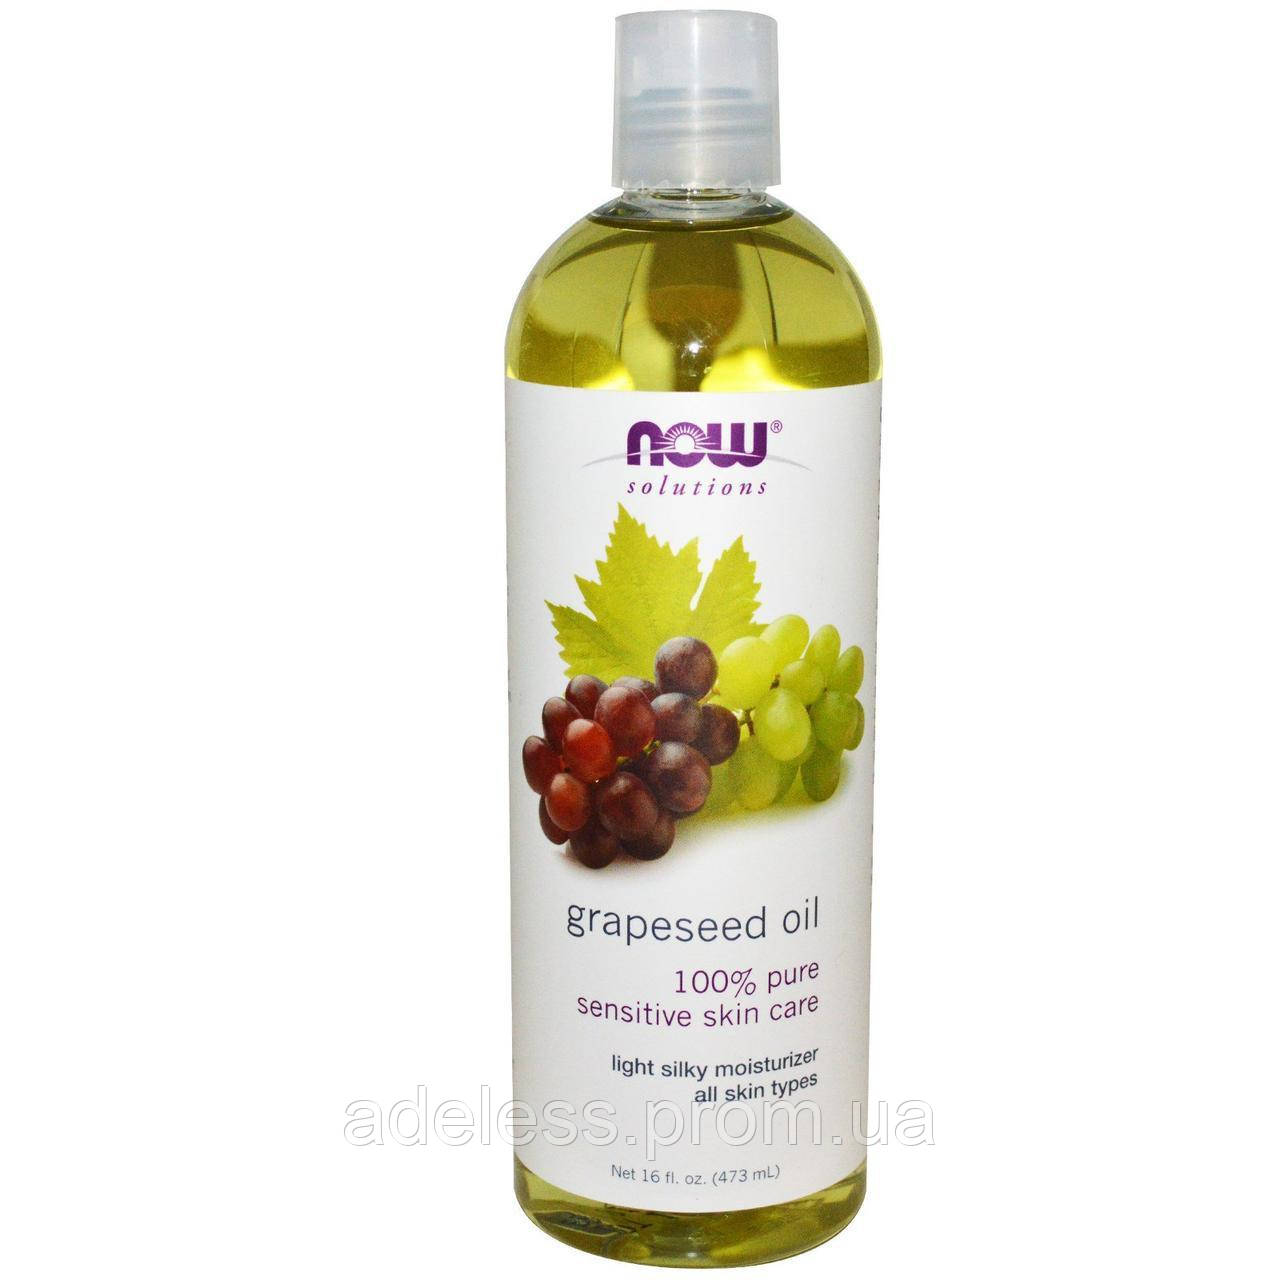 Масло Виноградных косточек NOW Foods Grapeseed Oil 100% pure, 350 мл.